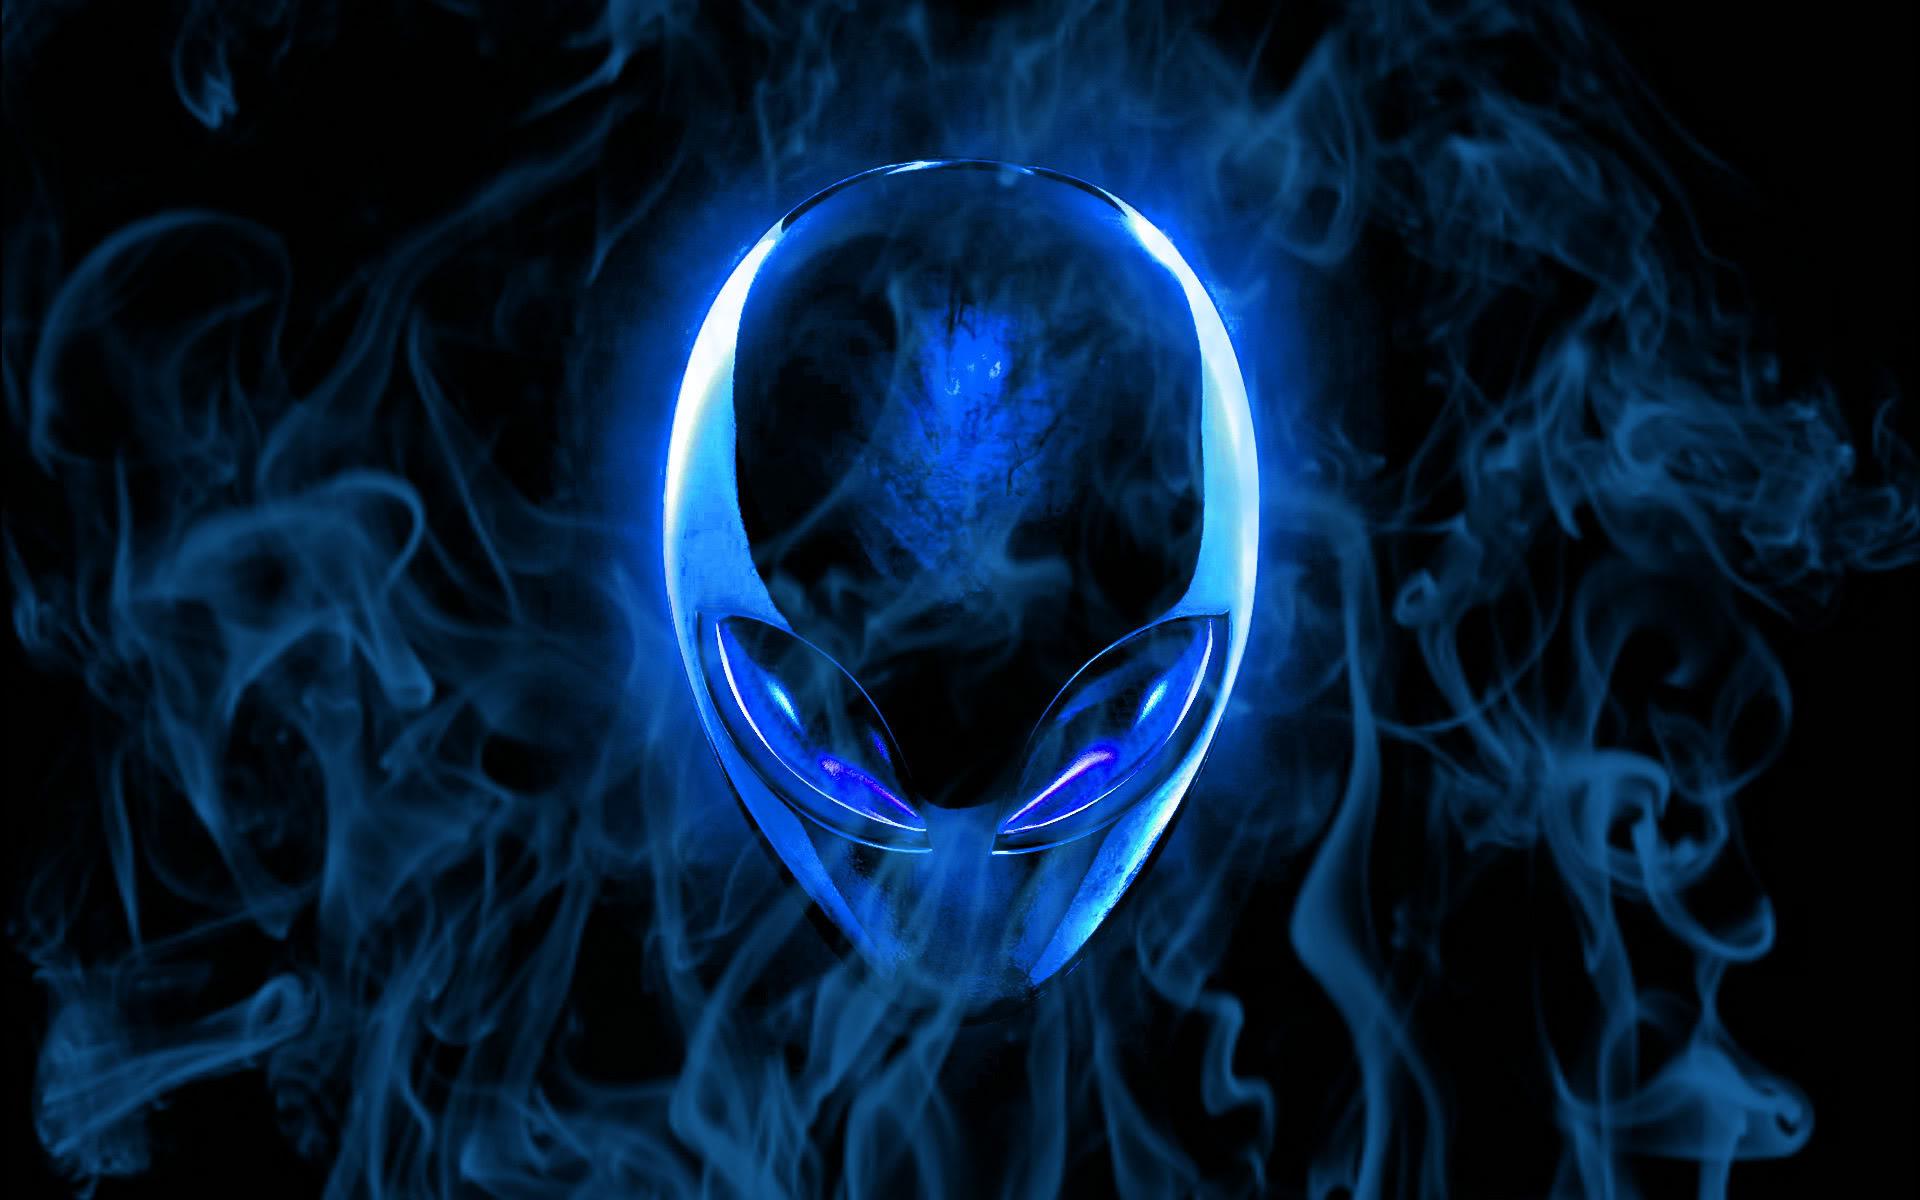 alienware smoke technology alienware wallpaper previous next random 1920x1200